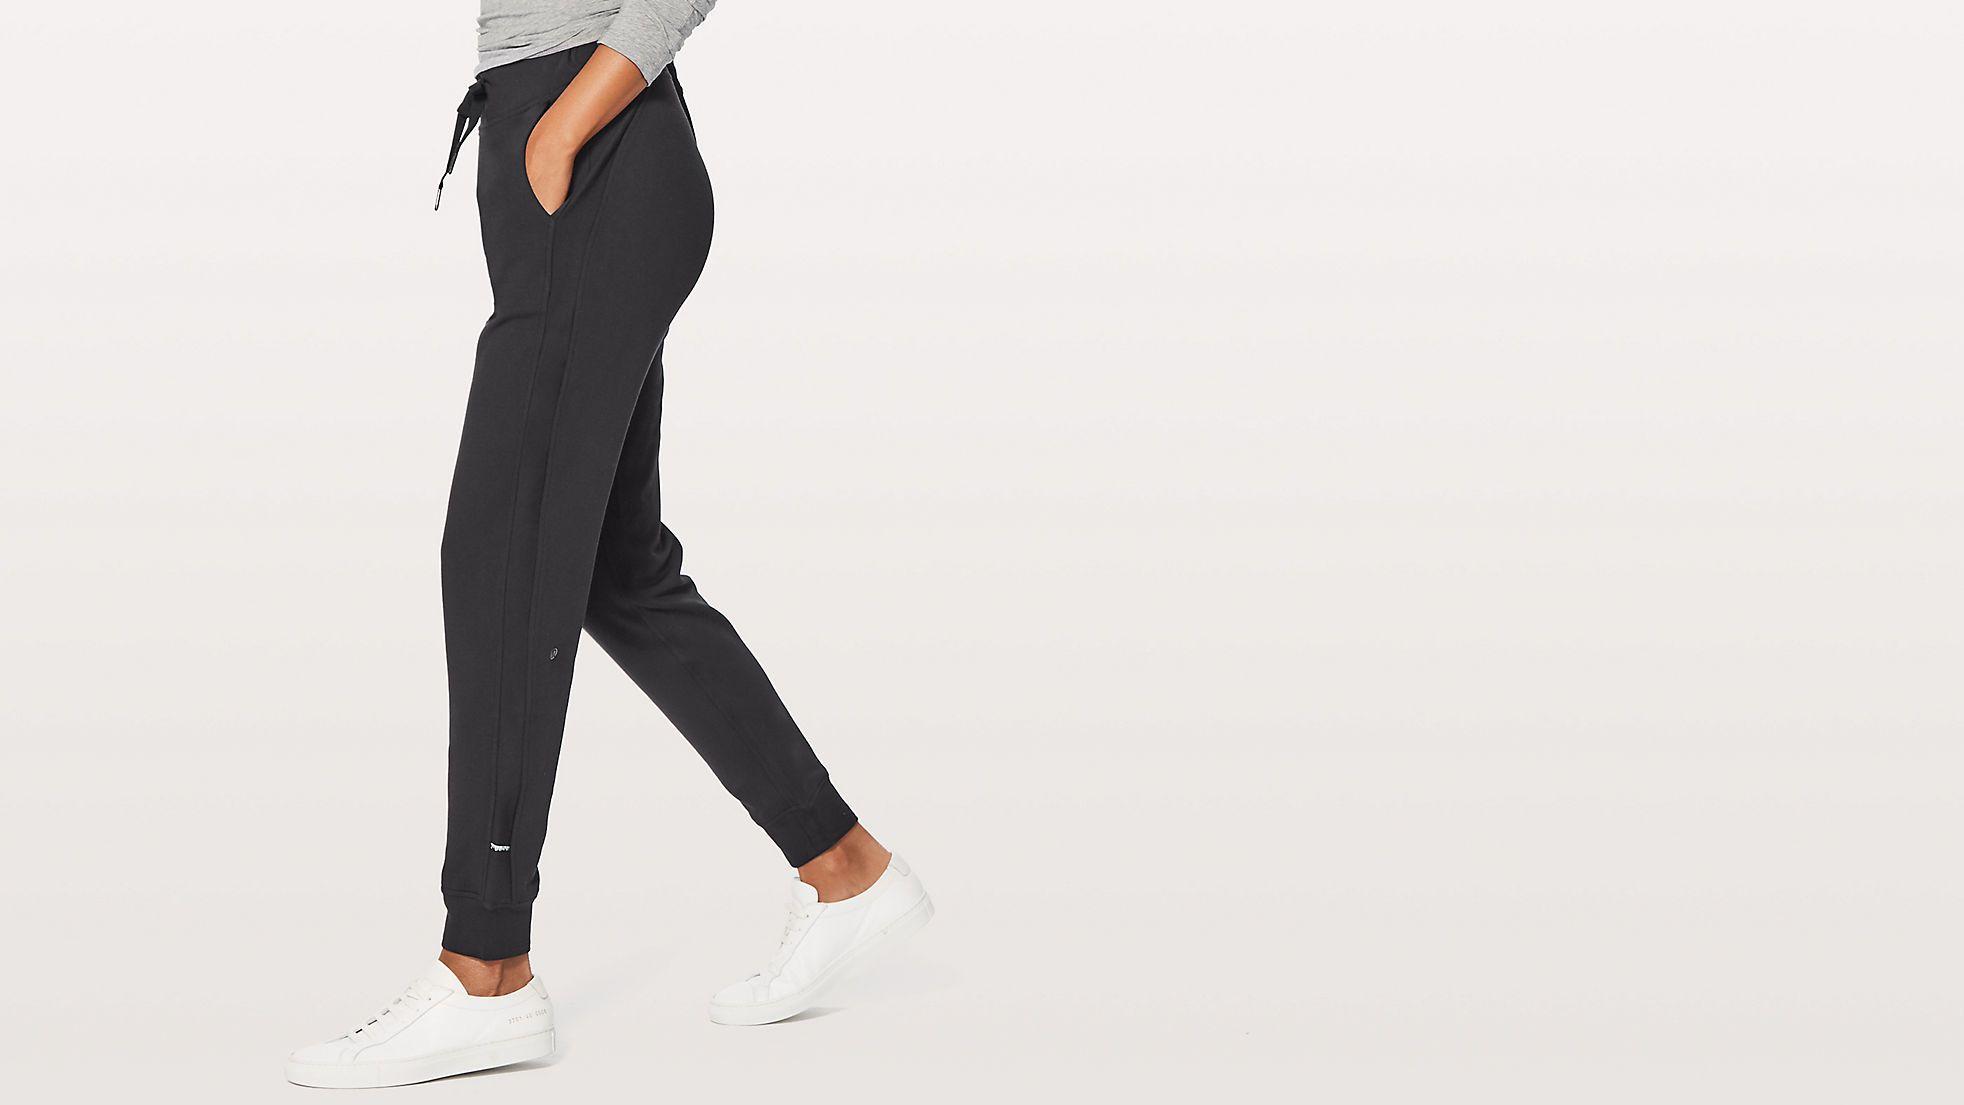 969218f7fec6be ready to rulu pant   women's pants   lululemon athletica   new ...